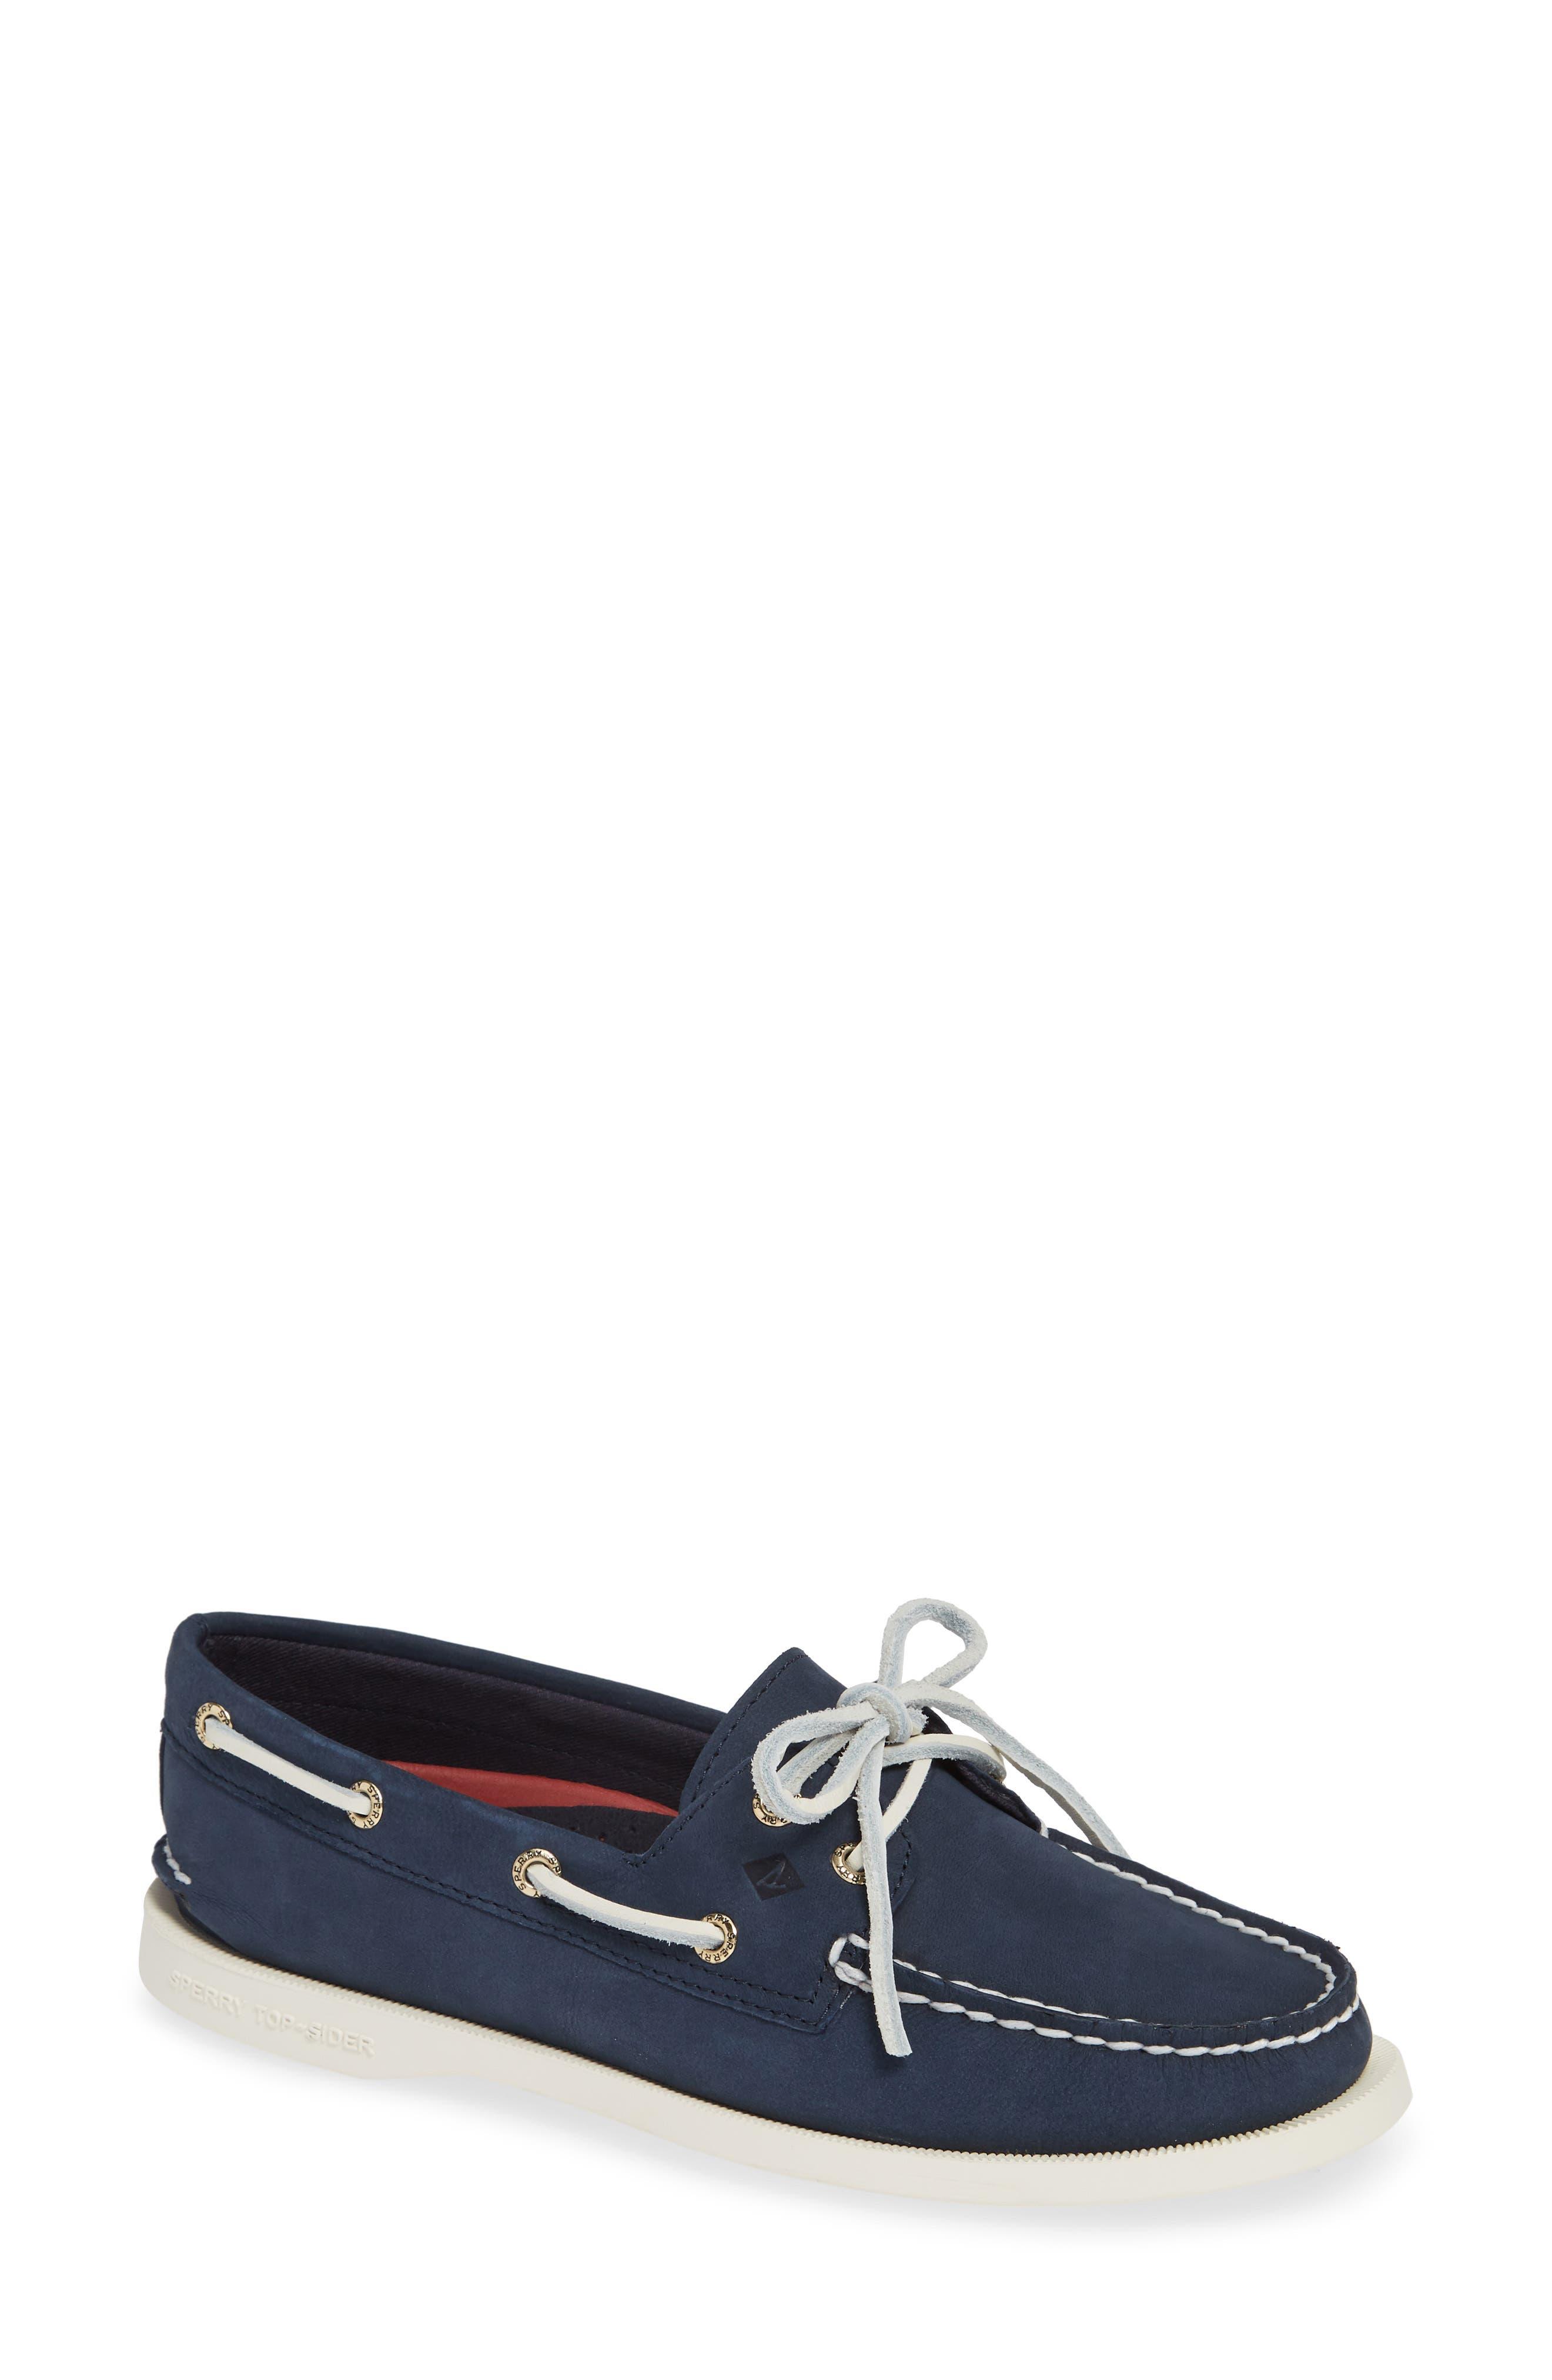 2-Eyelet Boat Shoe in Navy Leather